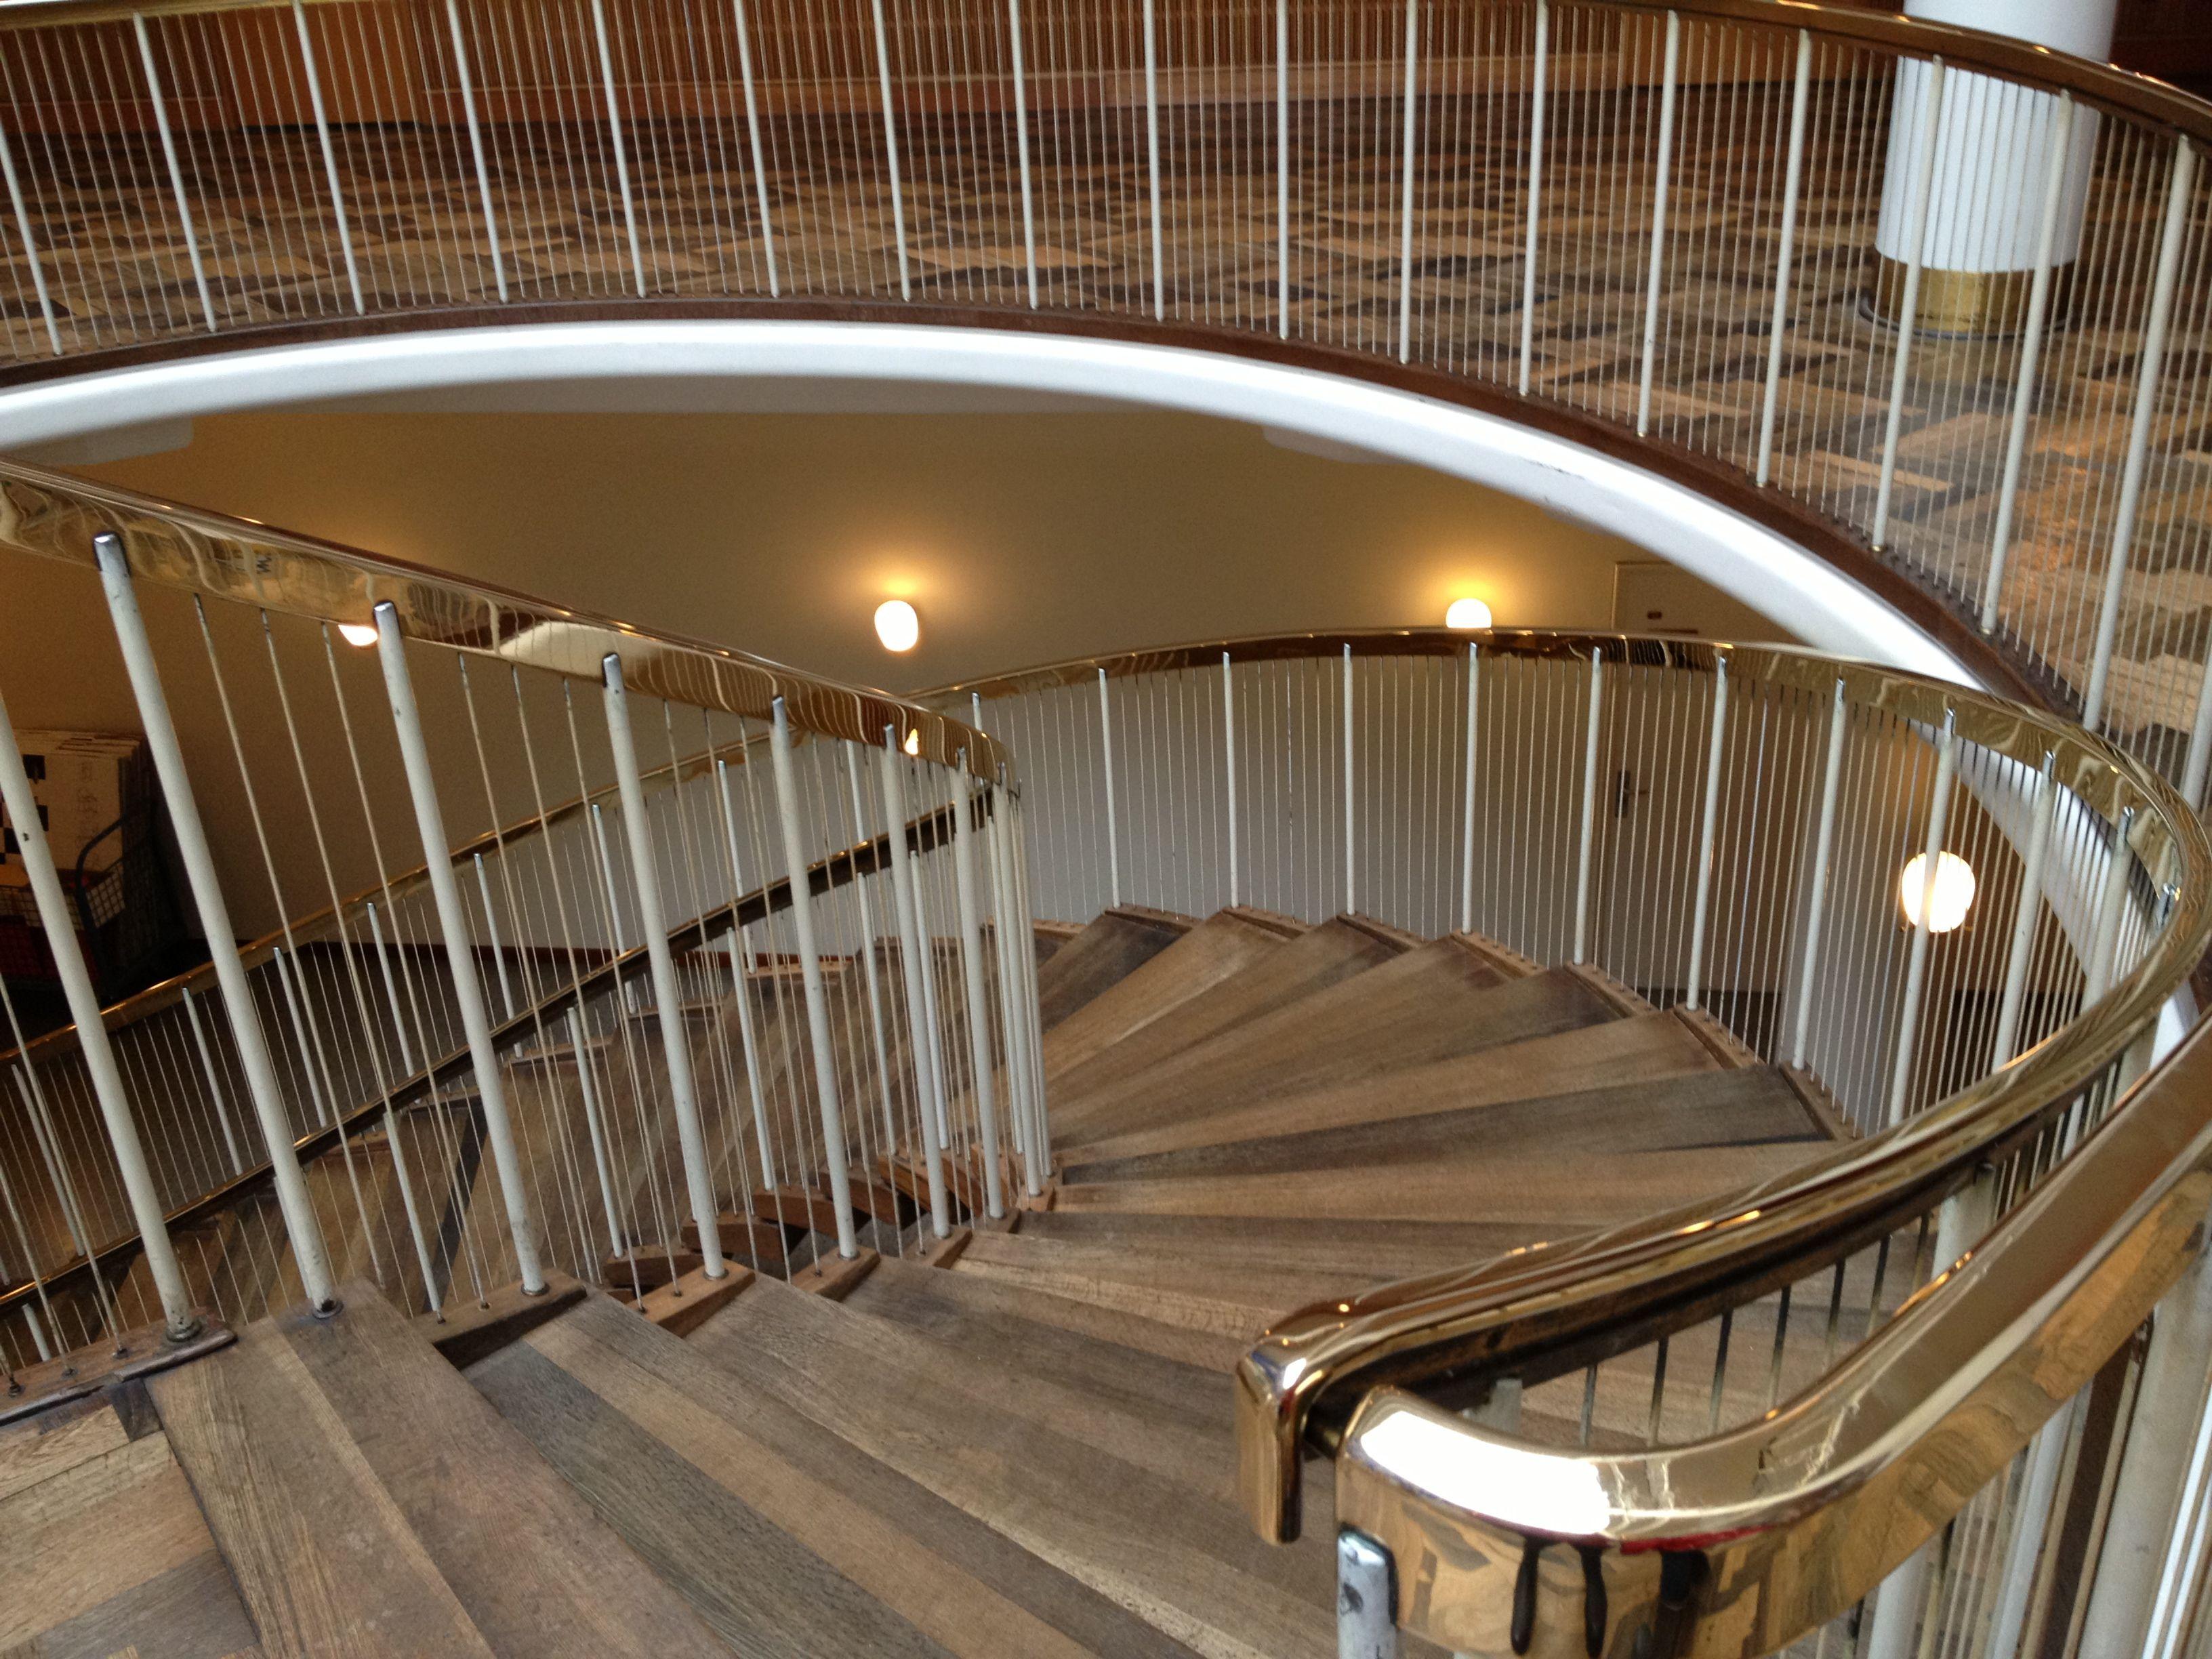 Best Arne Jacobsen Staircase Arne Jacobsen Architecture 400 x 300